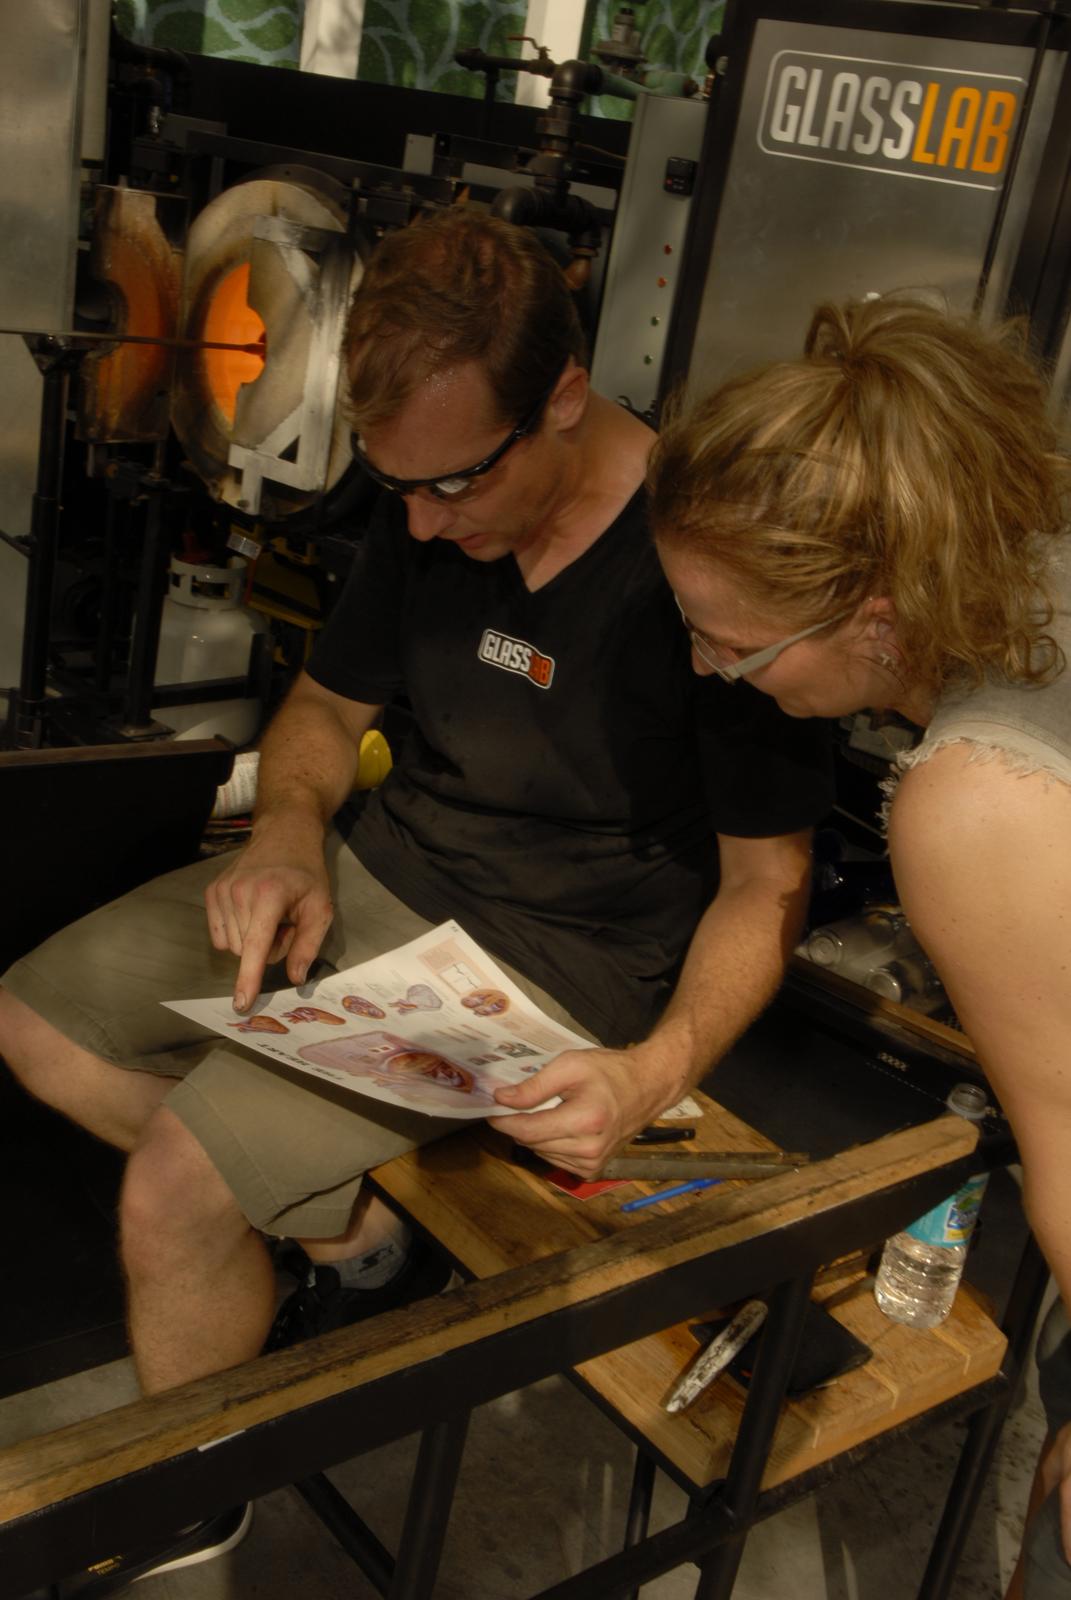 Designer Sigga Heimis at GlassLab